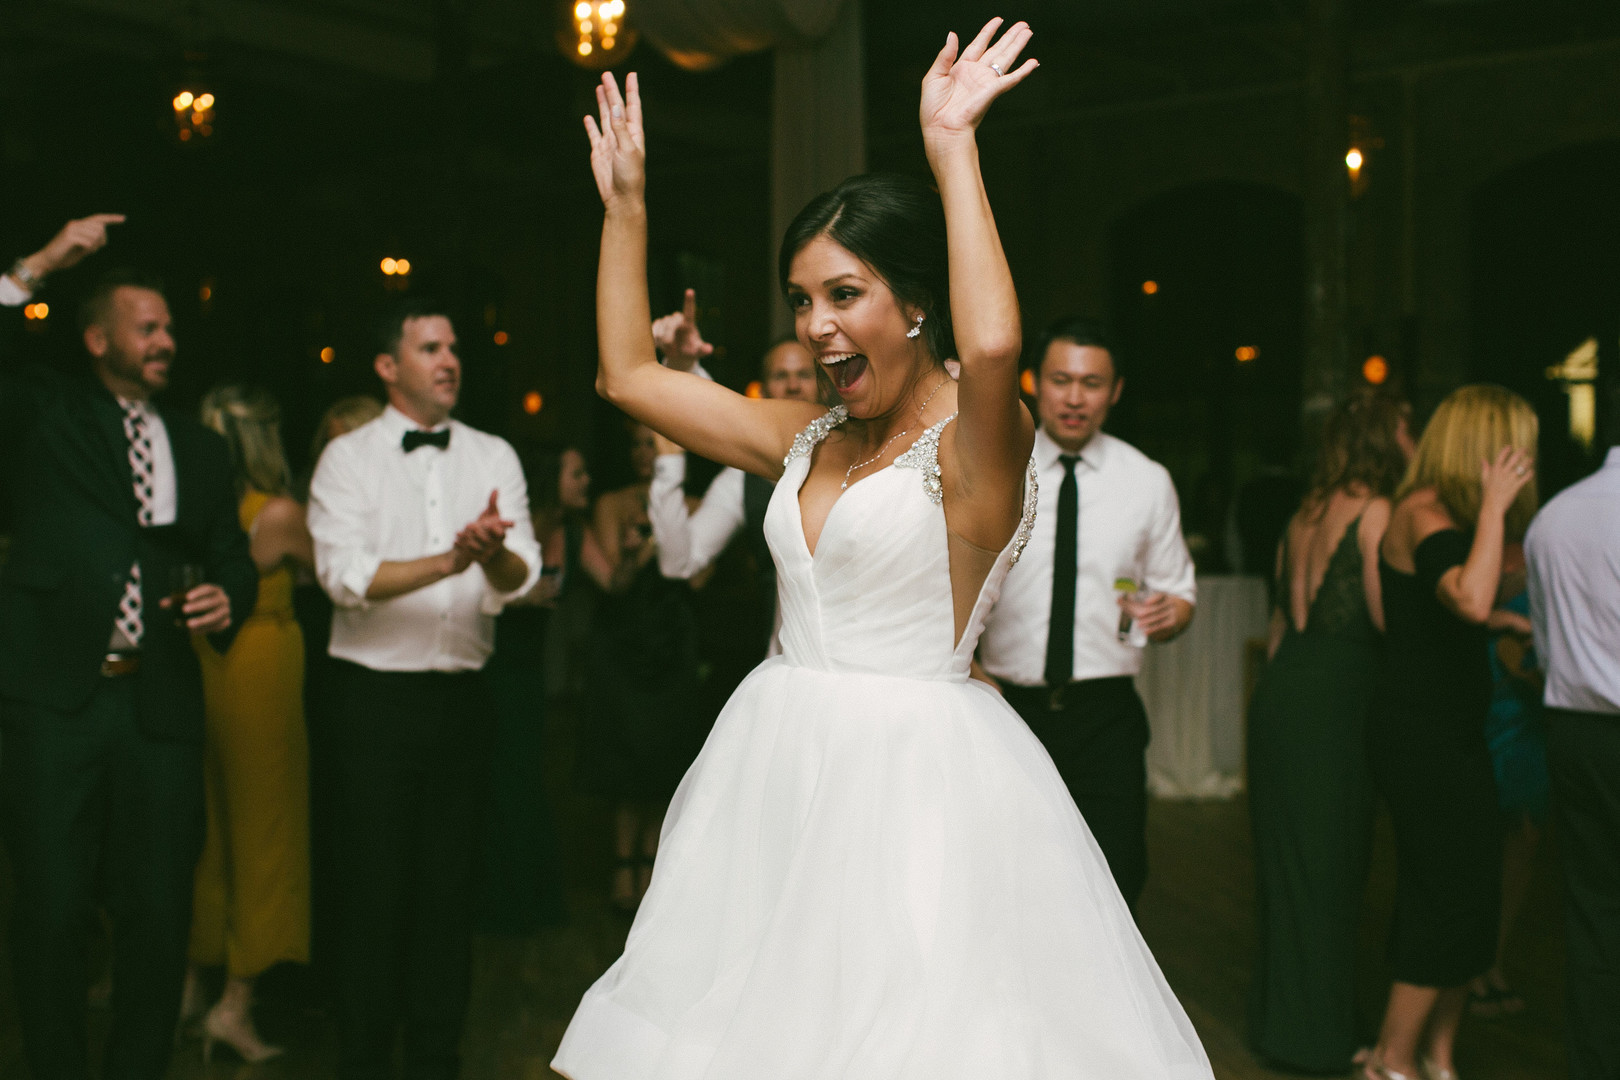 cedar-room-wedding-47.jpg